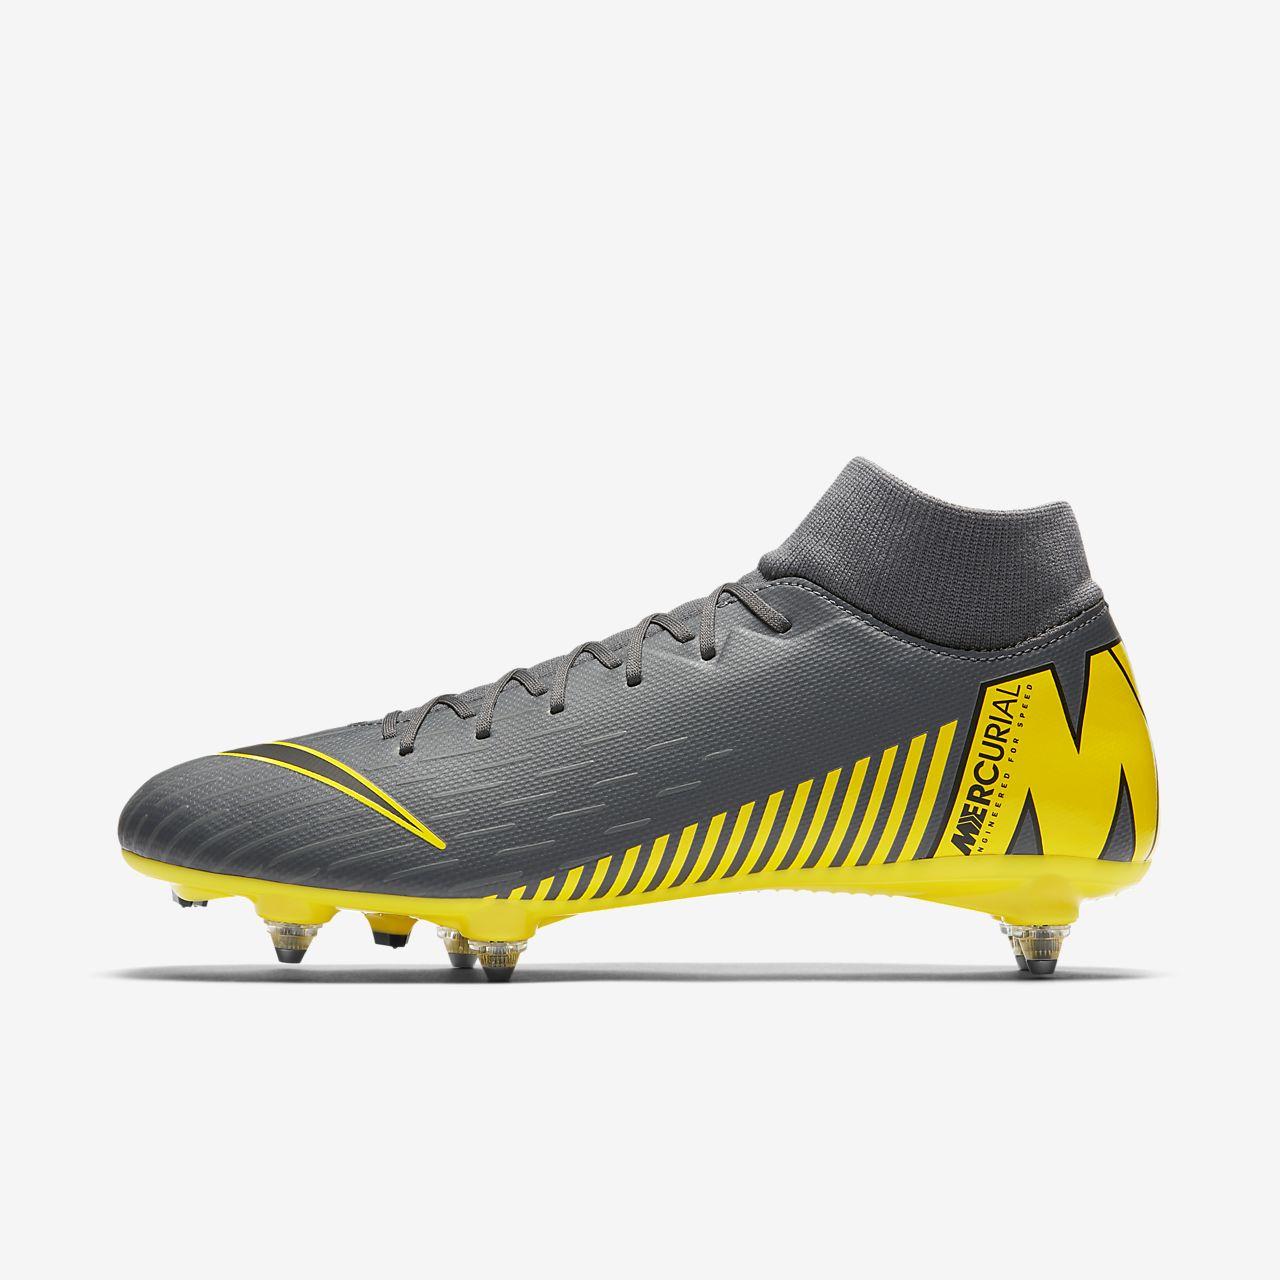 Nike Mercurial Superfly VI Academy SG-PRO Soft-Ground Football Boot ... 7b2a7ba3bca